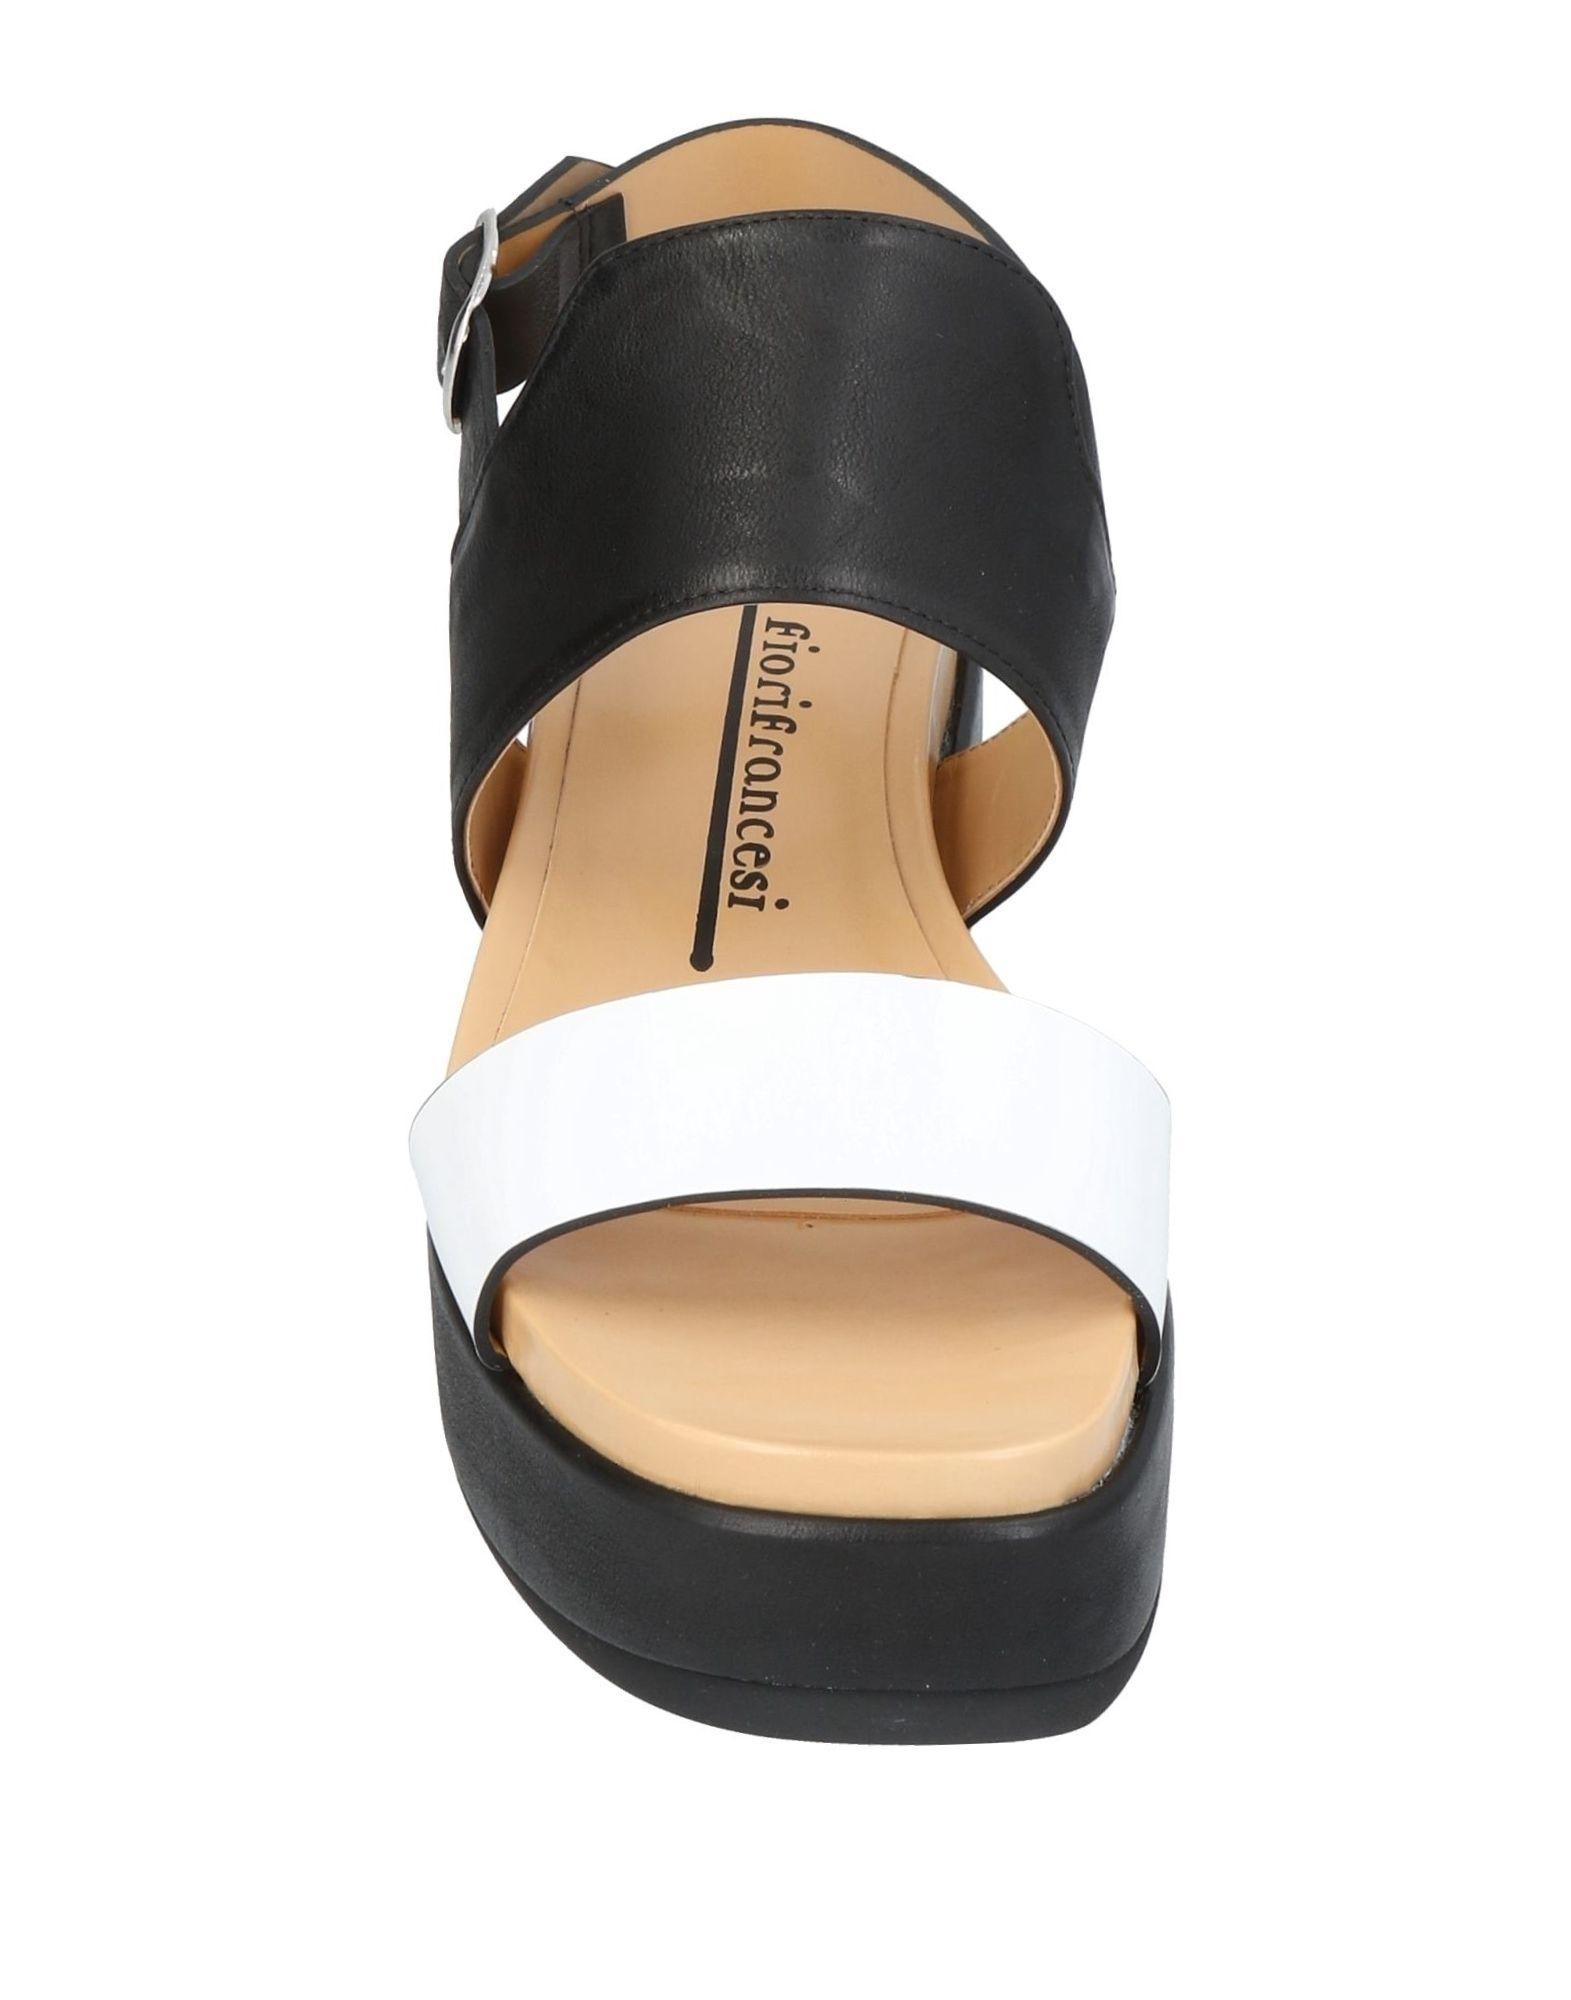 Haltbare Mode billige Schuhe Fiorifrancesi Sandalen Damen   Damen 11419341FF Heiße Schuhe da4cbf